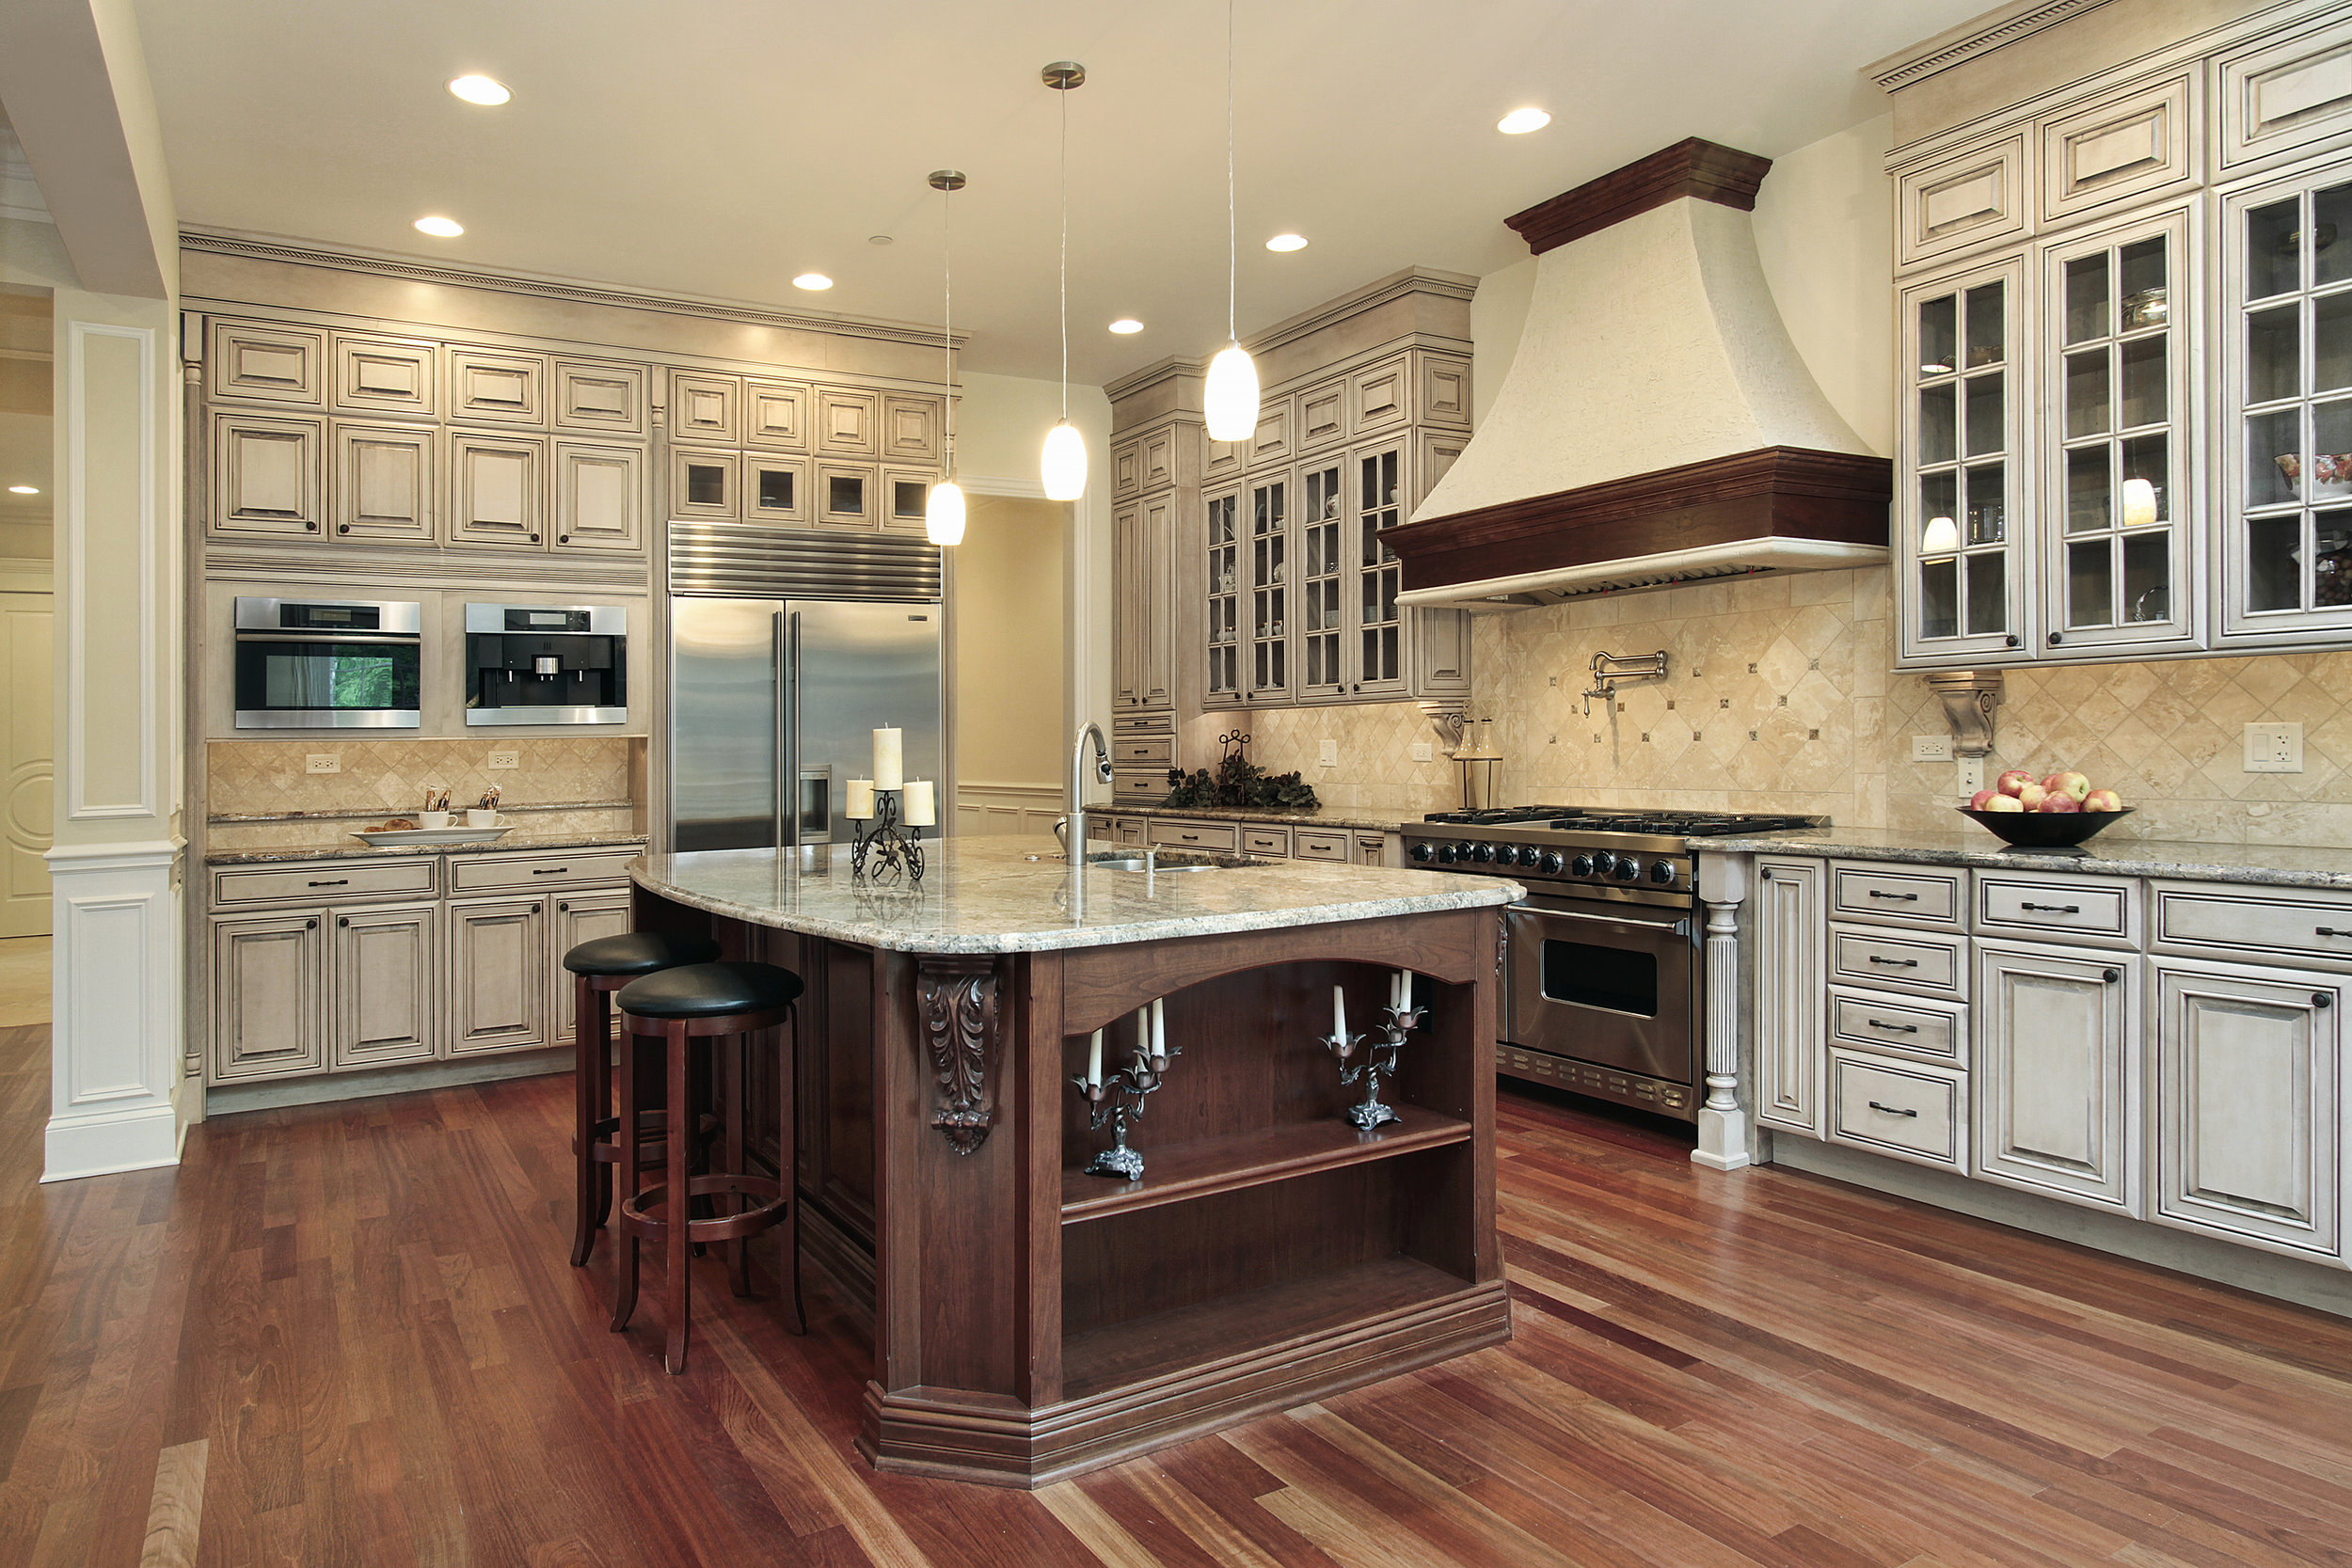 bigstock-Kitchen-in-luxury-home-with-re-16568345.jpg